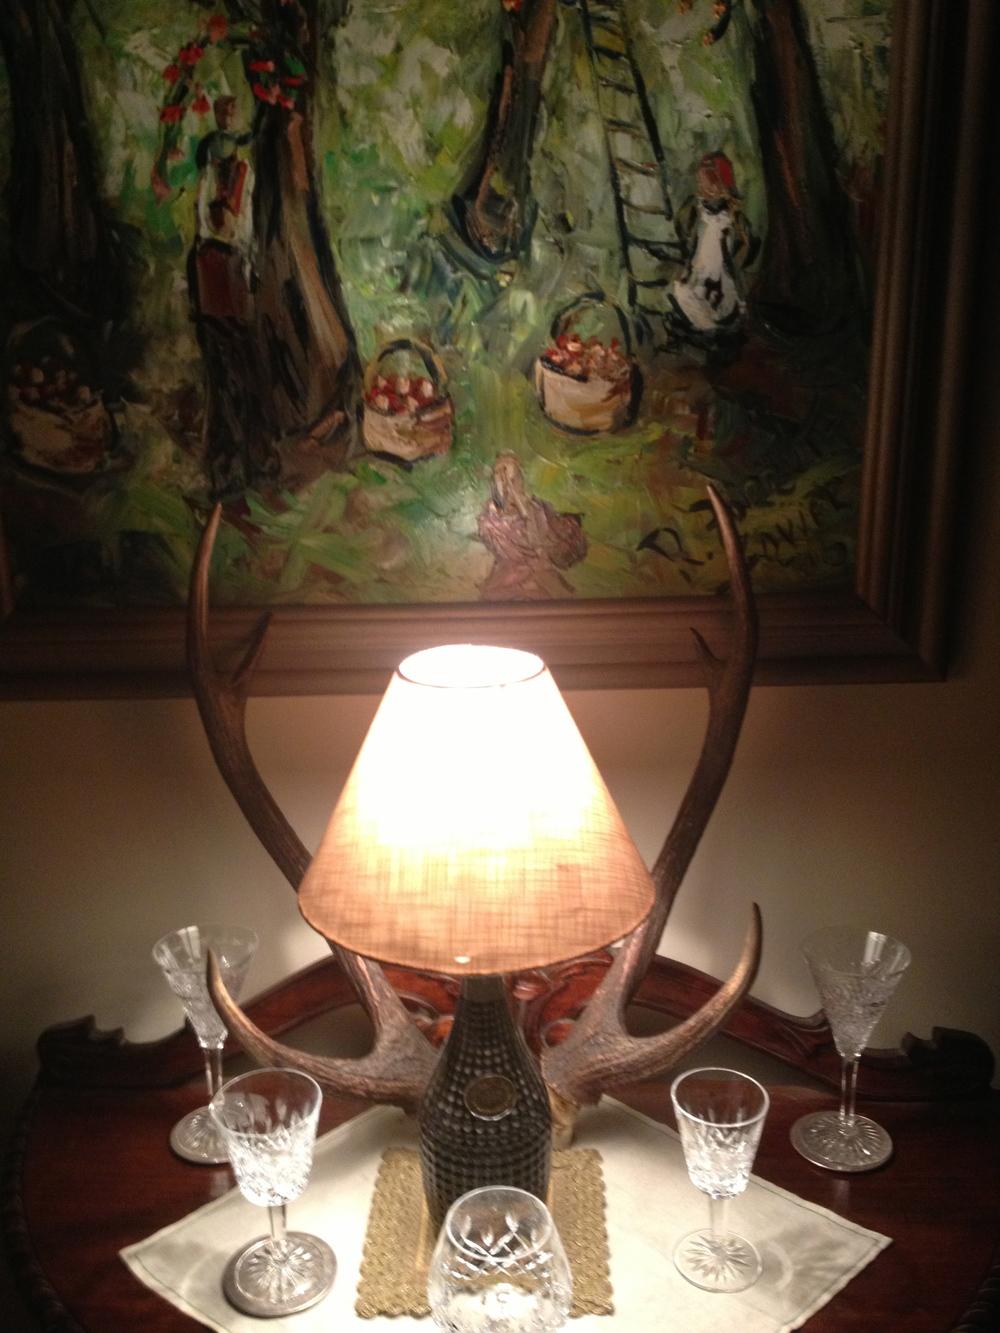 Original art works & European crystal glassware.